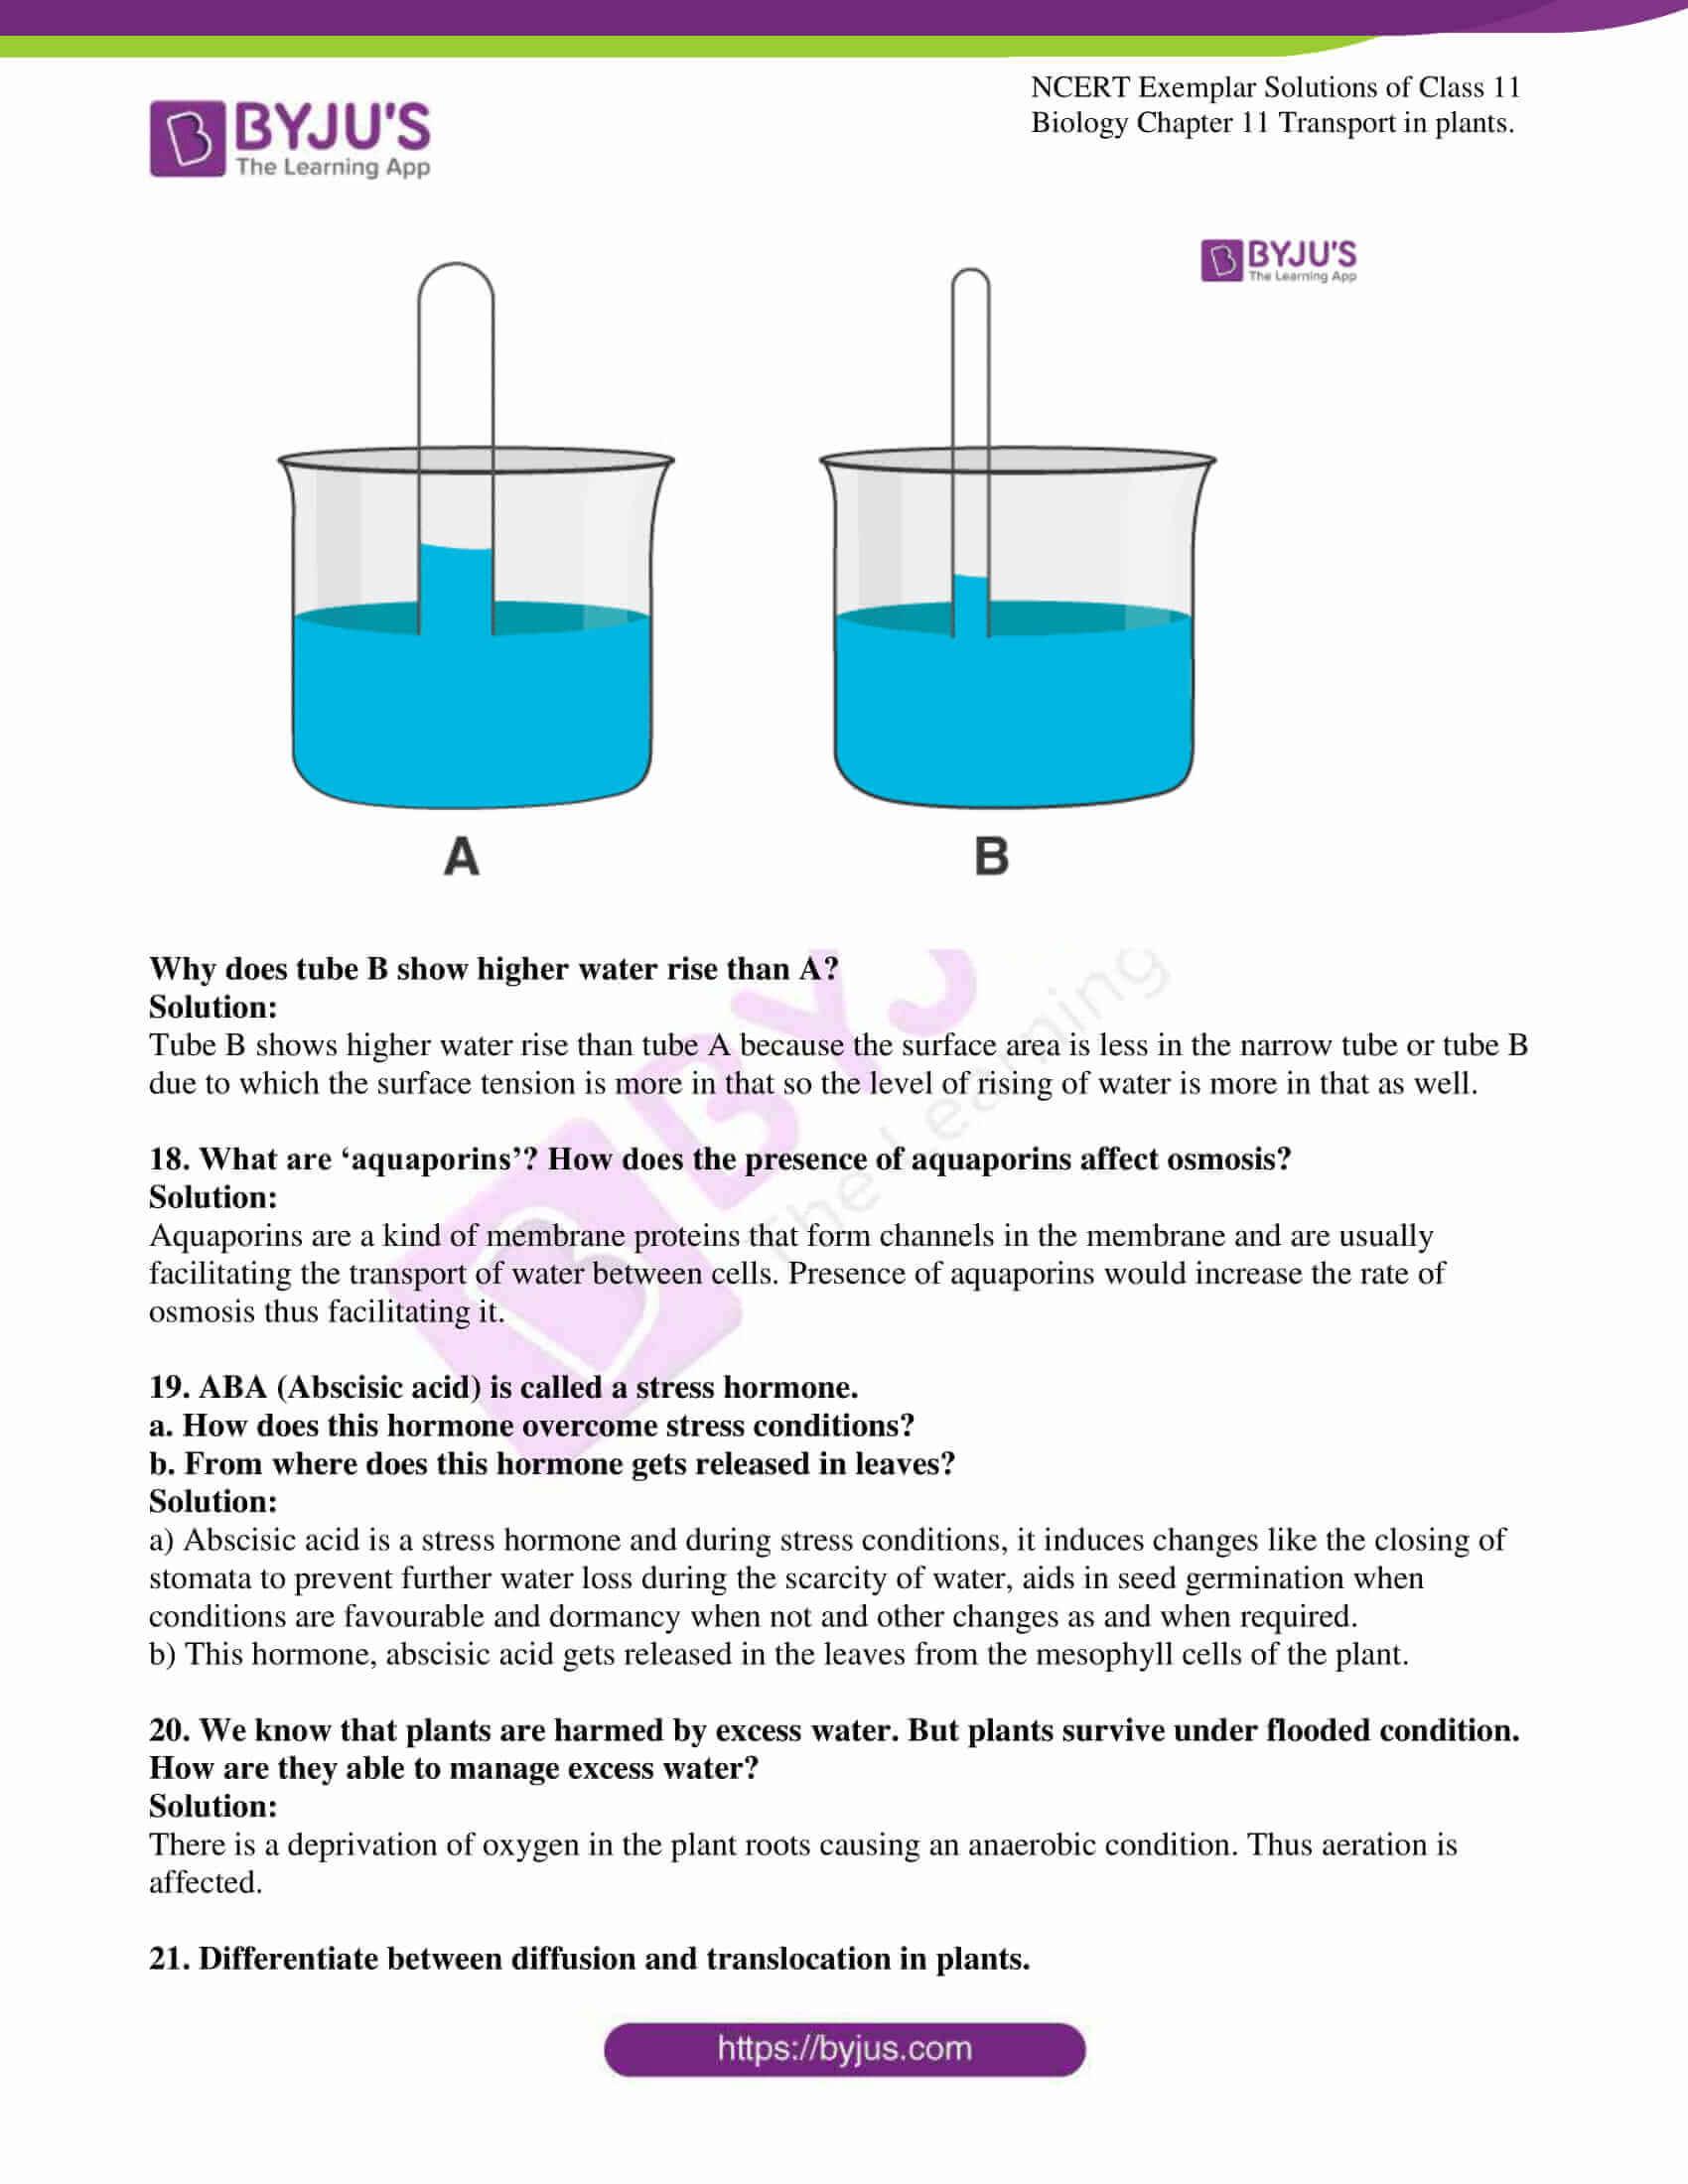 ncert exemplar solutions for class 11 bio chapter 11 11